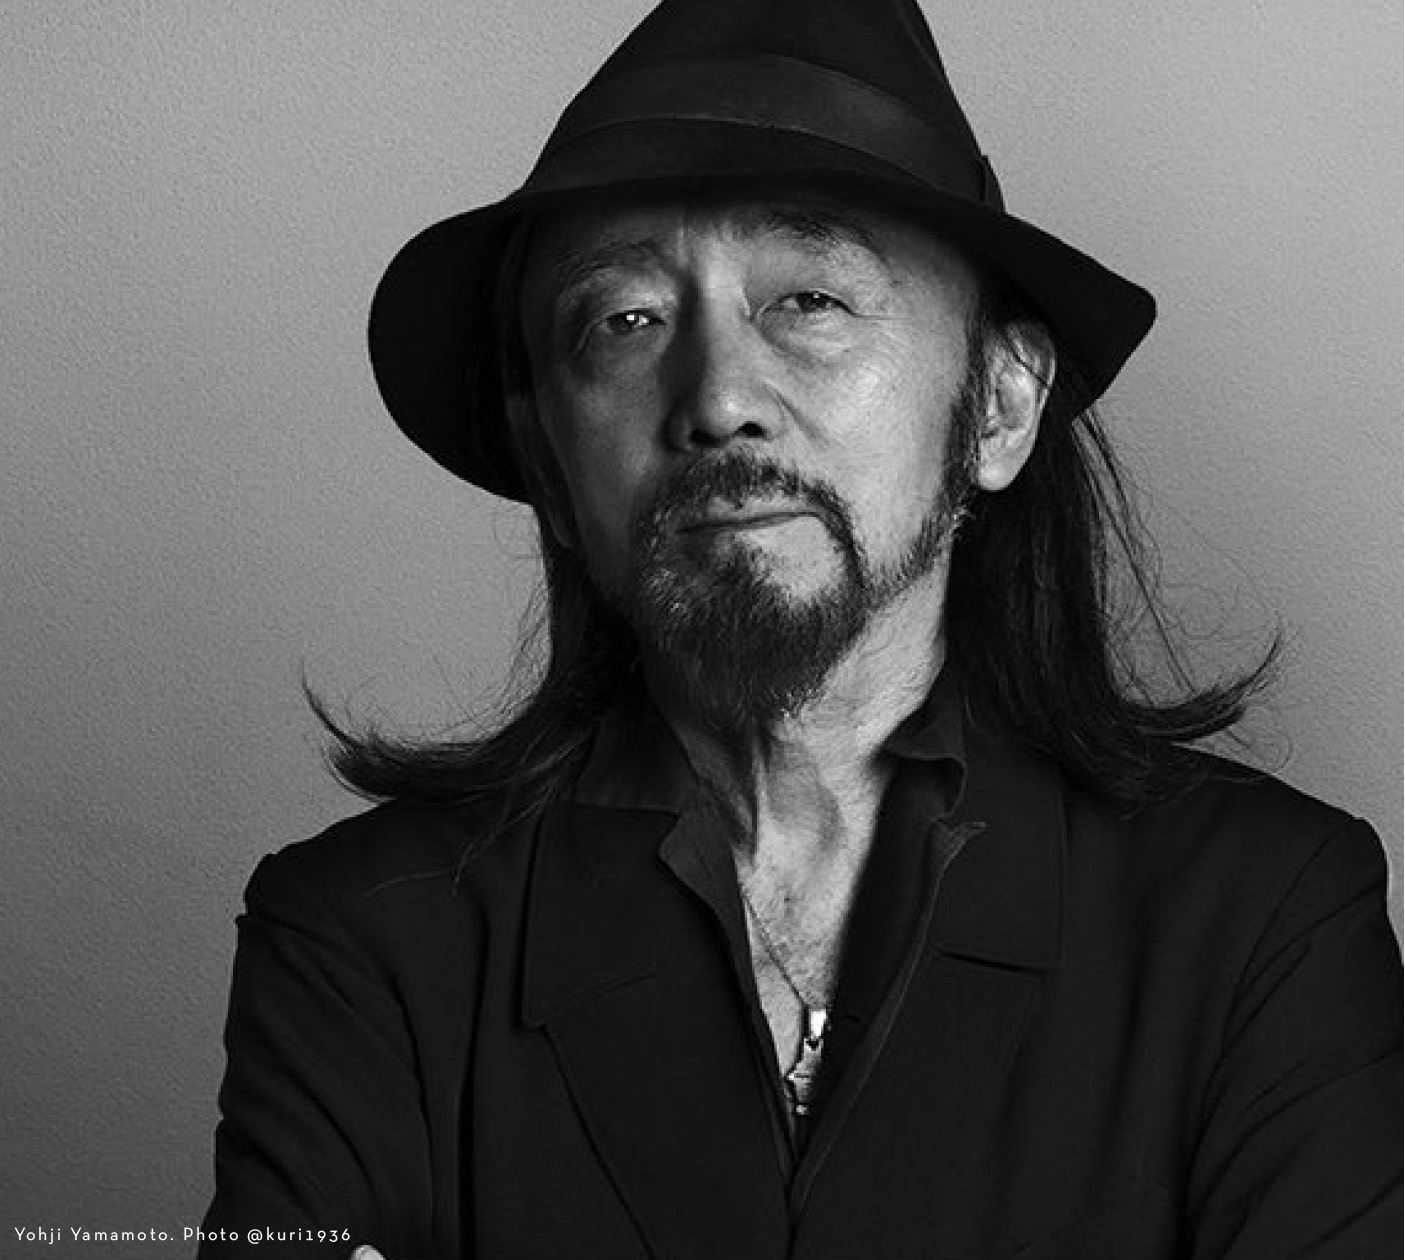 Uniform Dresser - Yohji Yamamoto